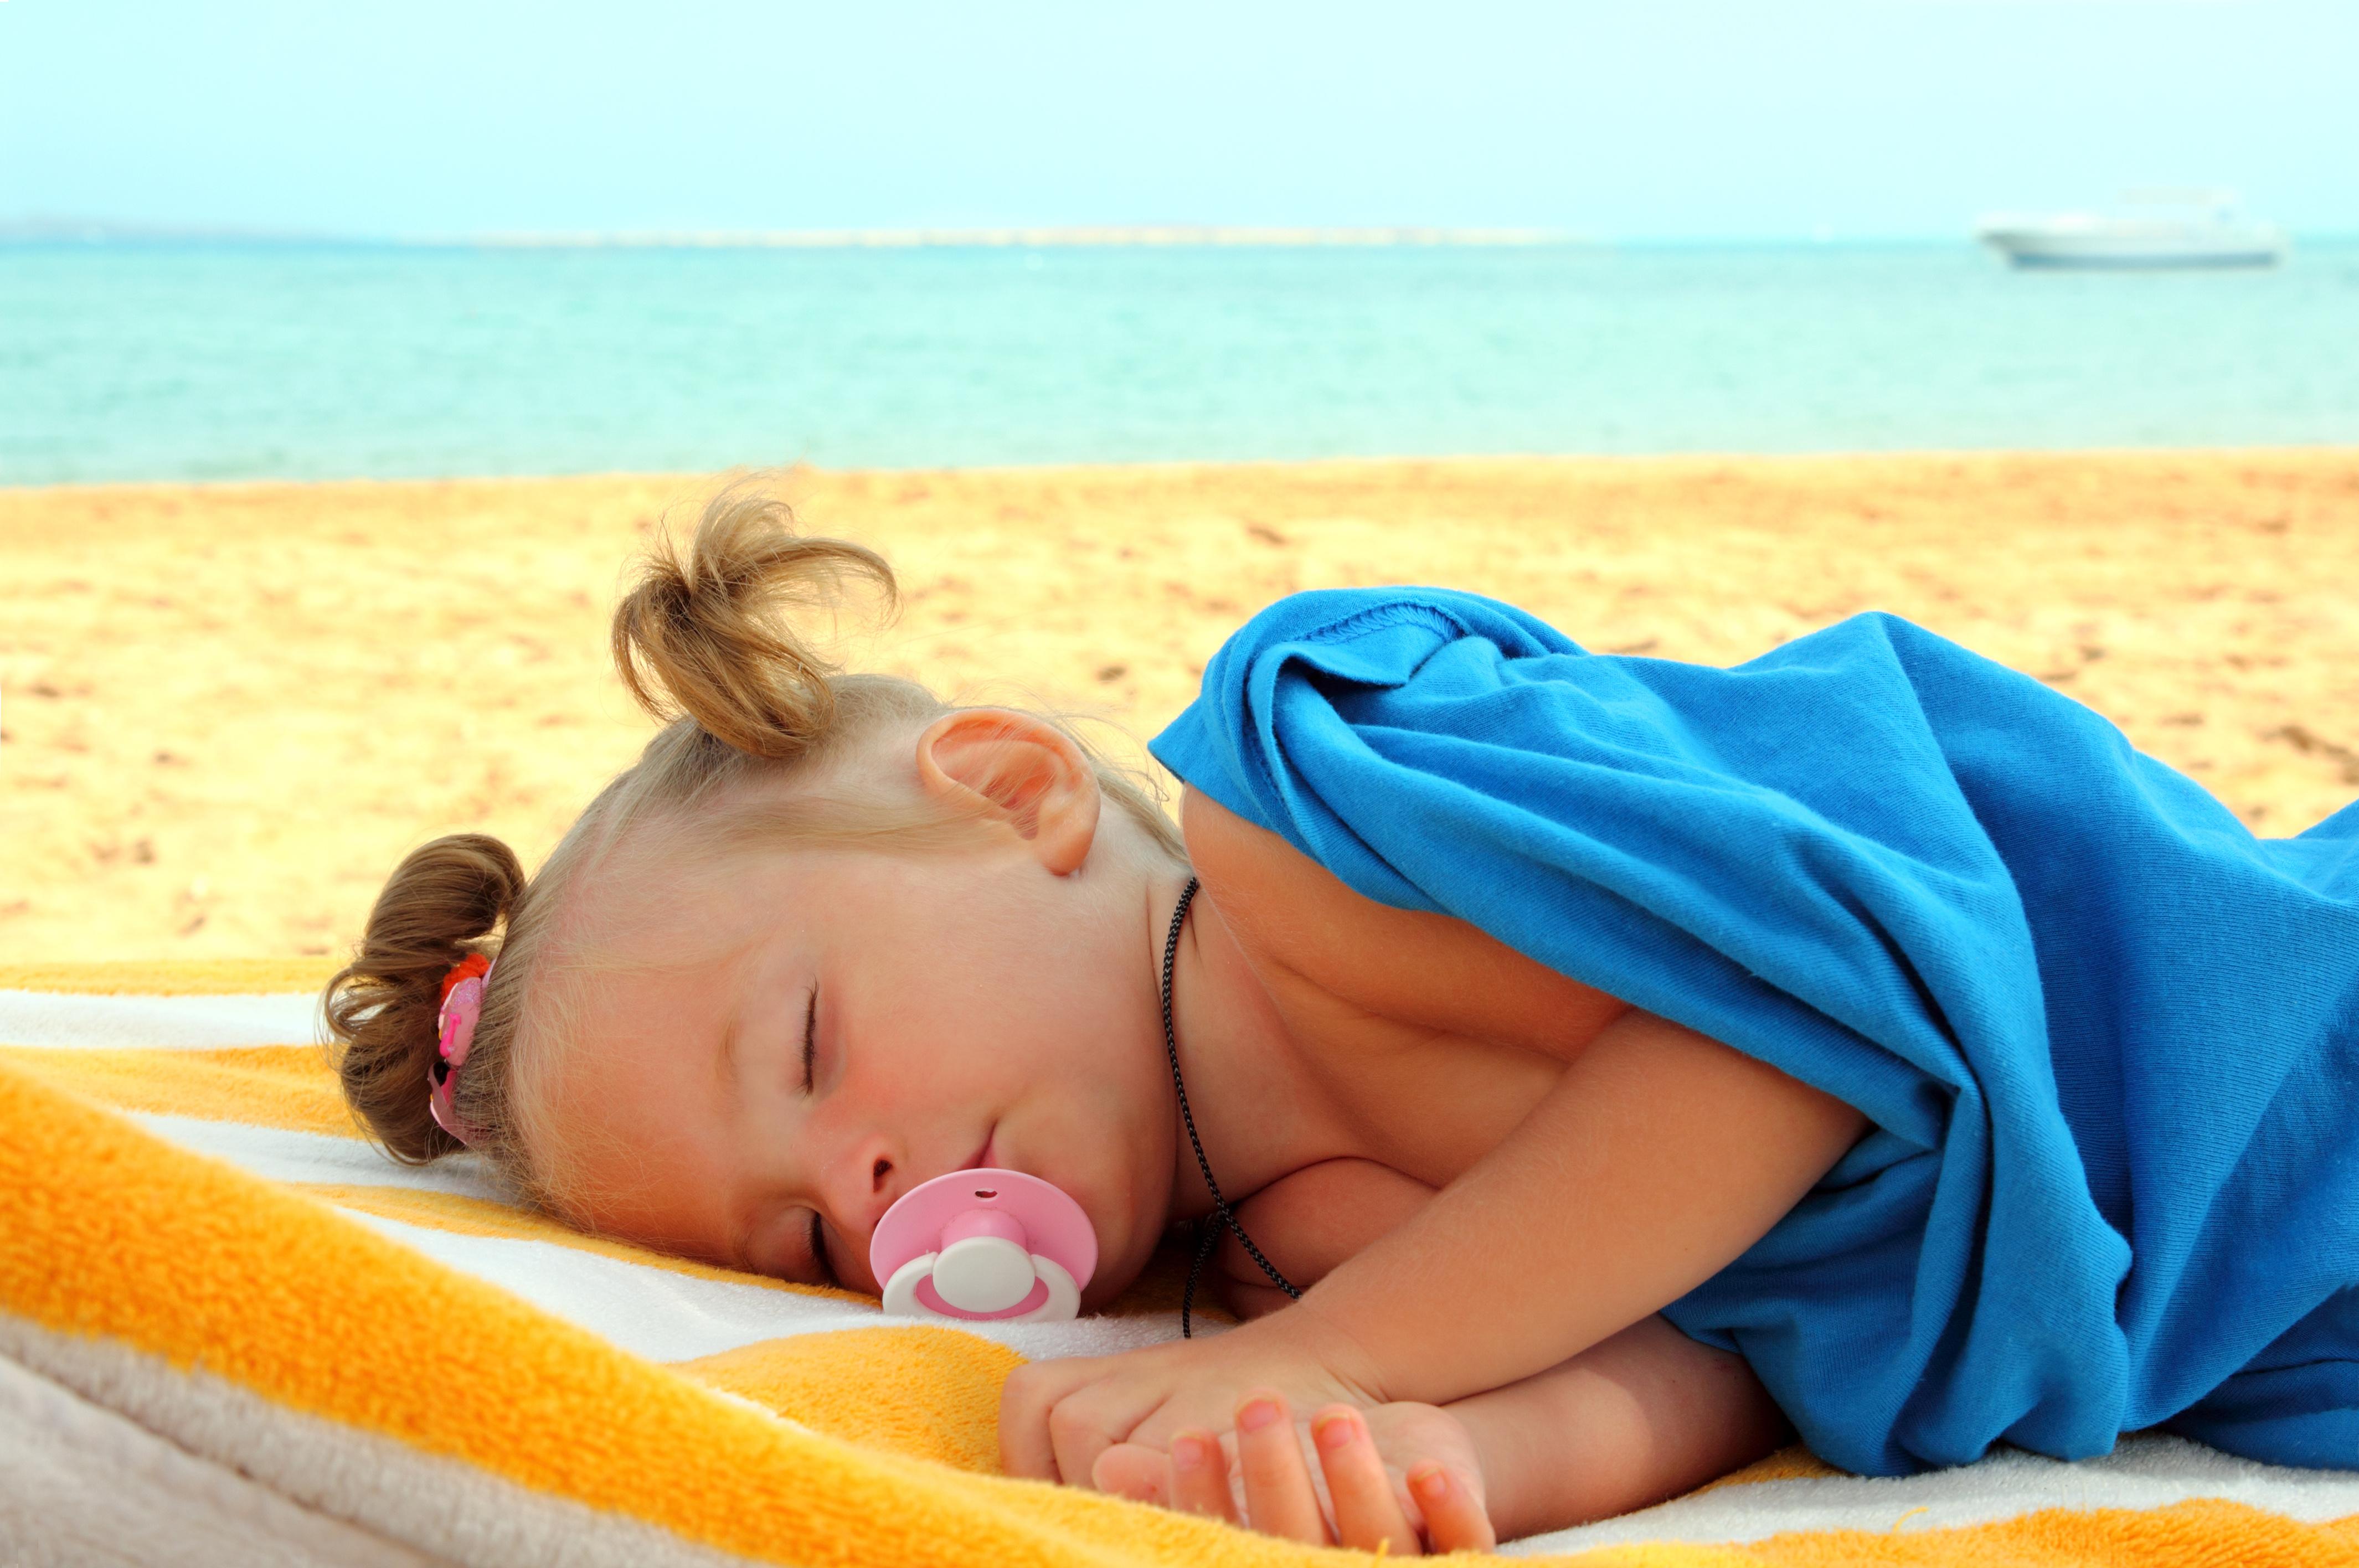 little girl sleeping on beach